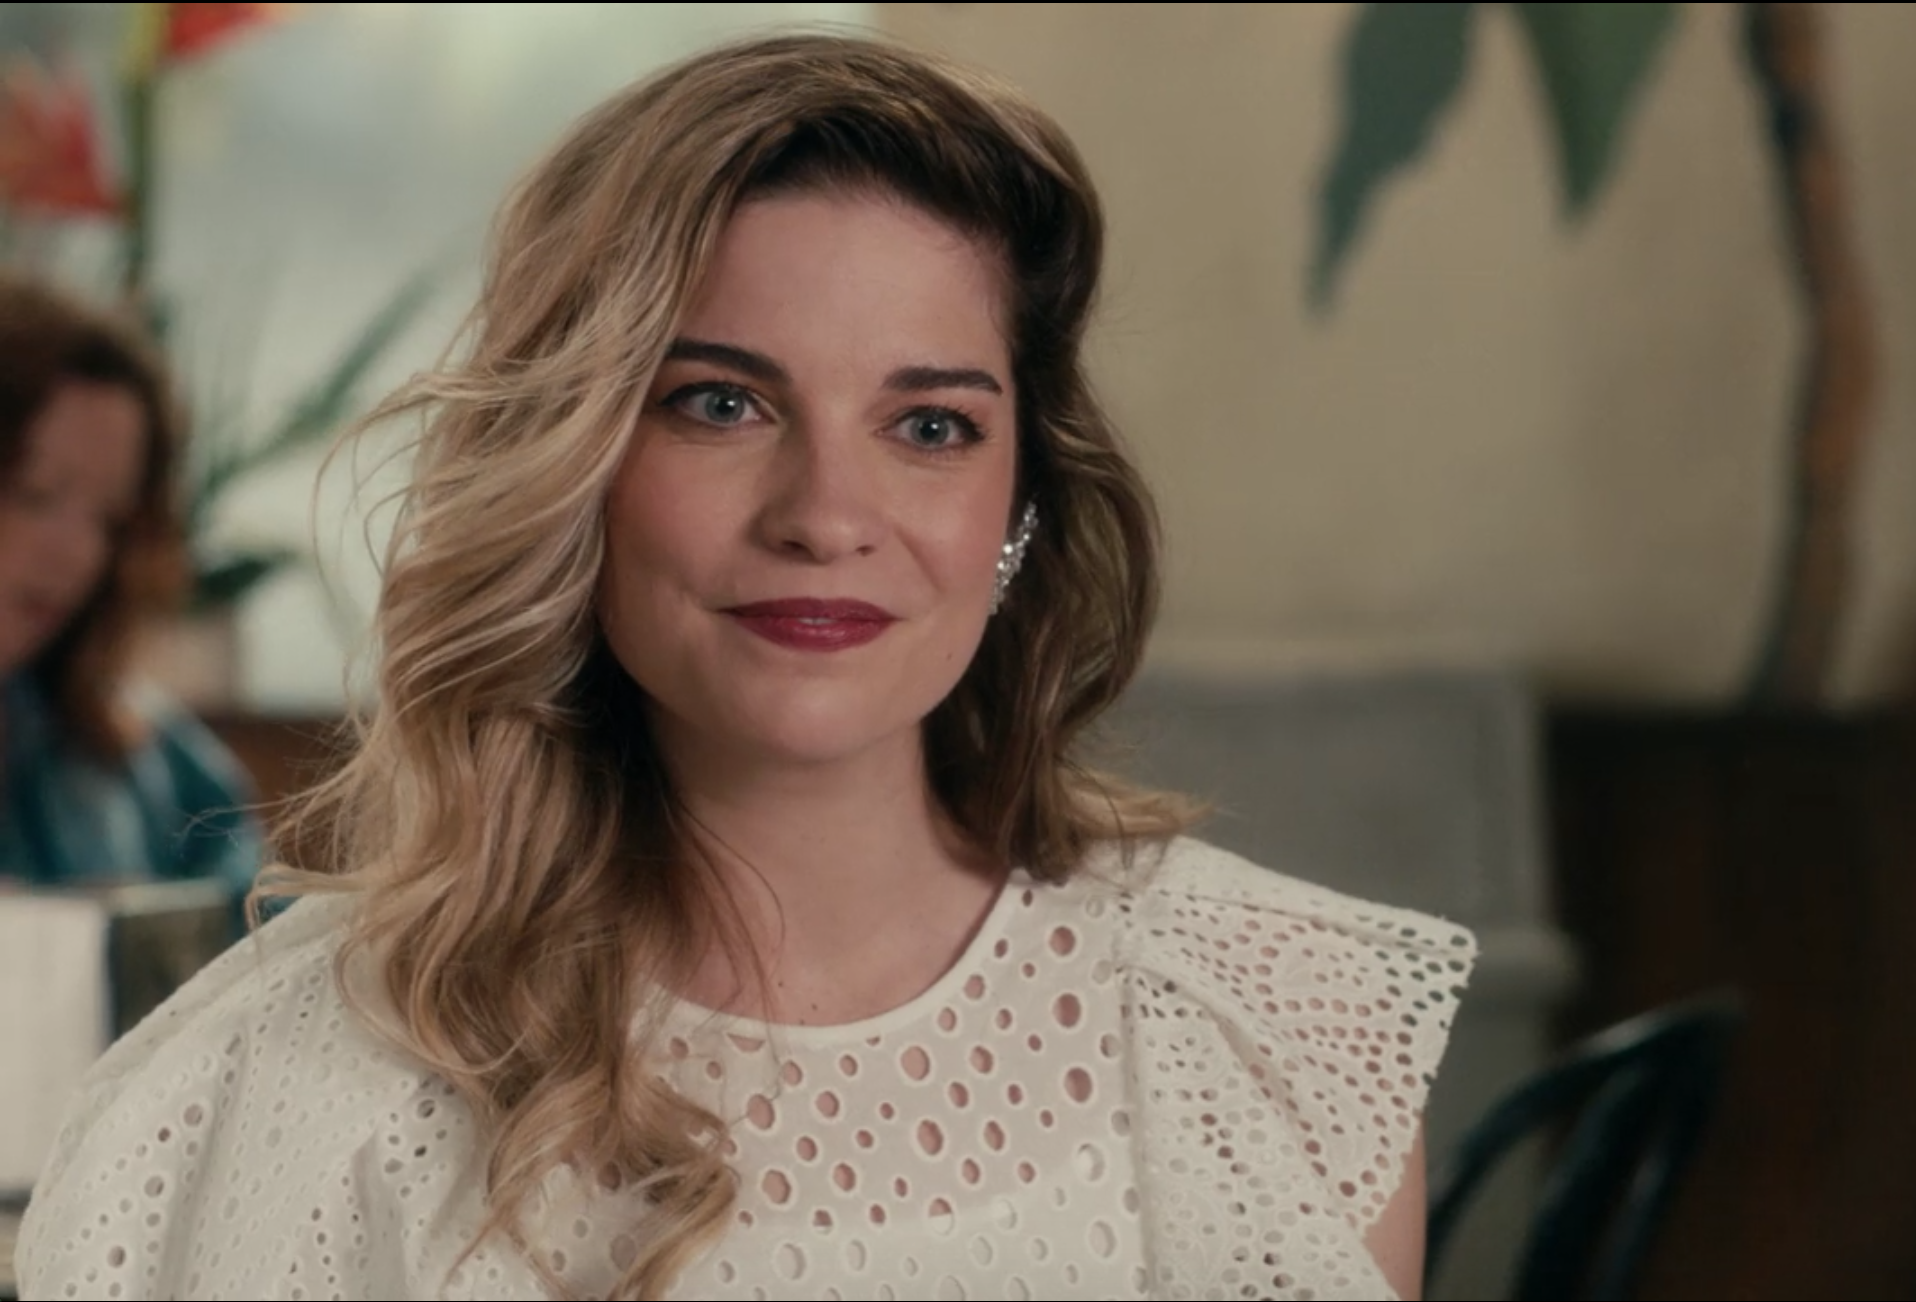 Screenshot of Alexis smiling